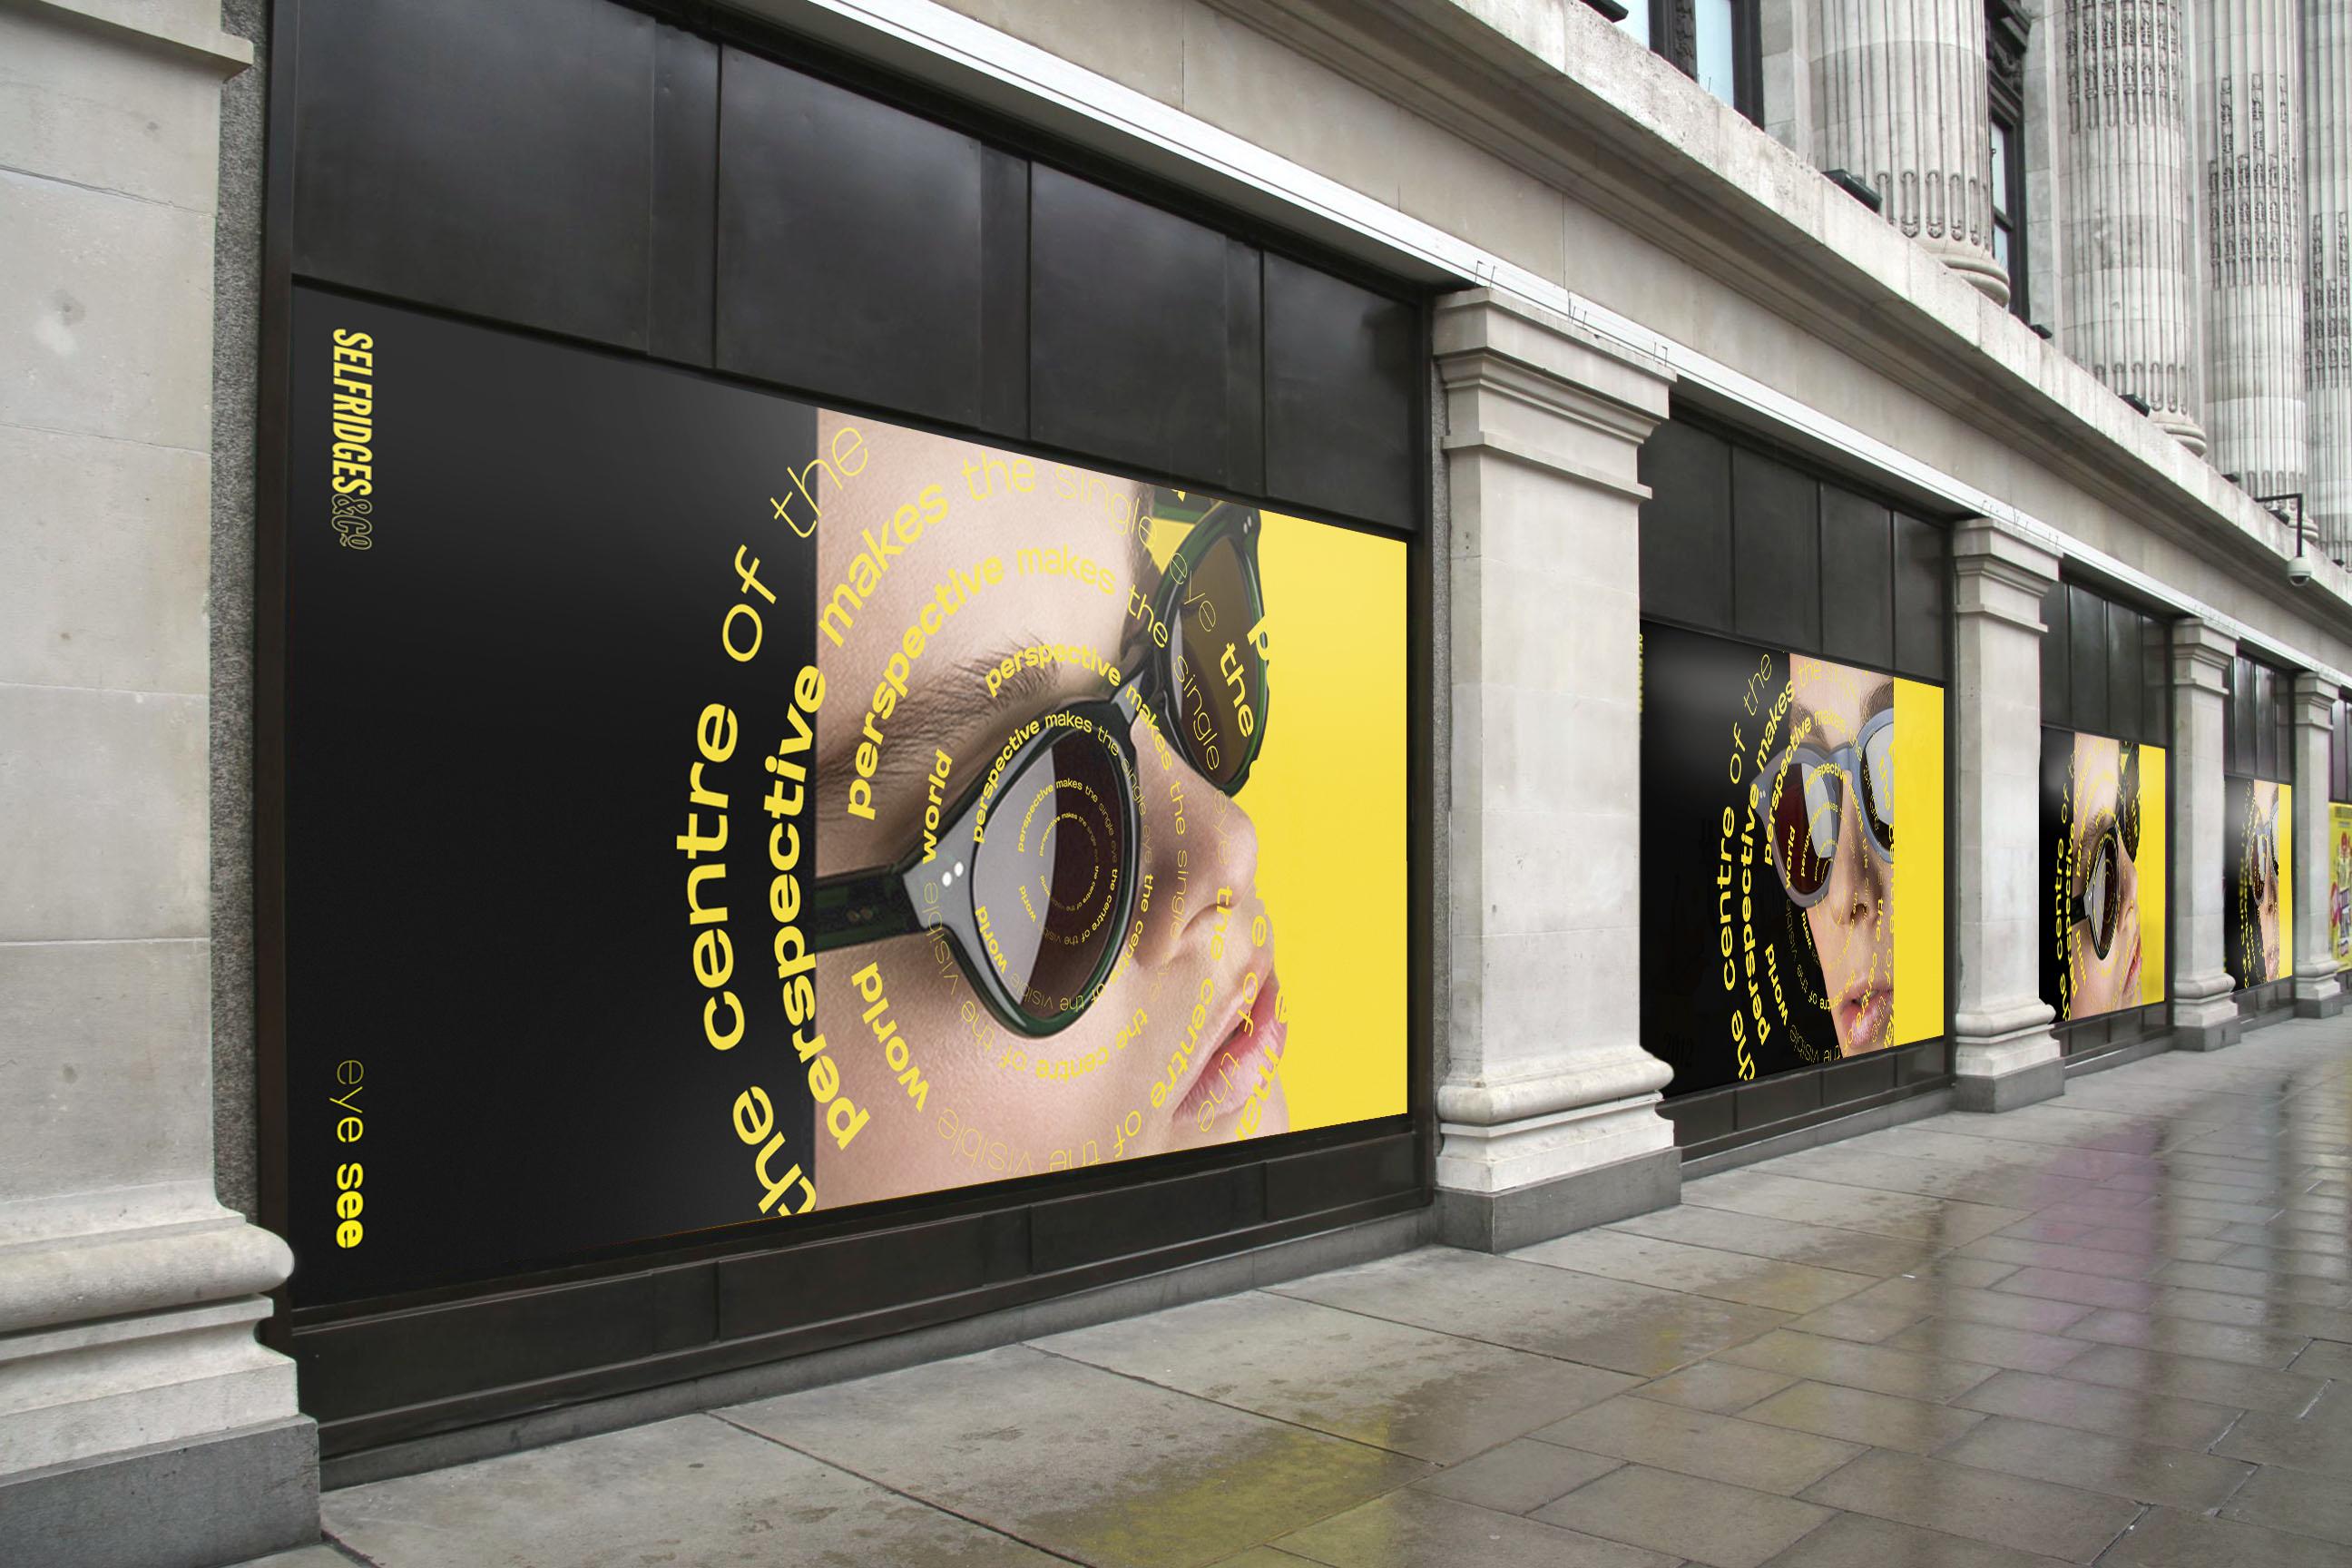 Selfridges Billboards